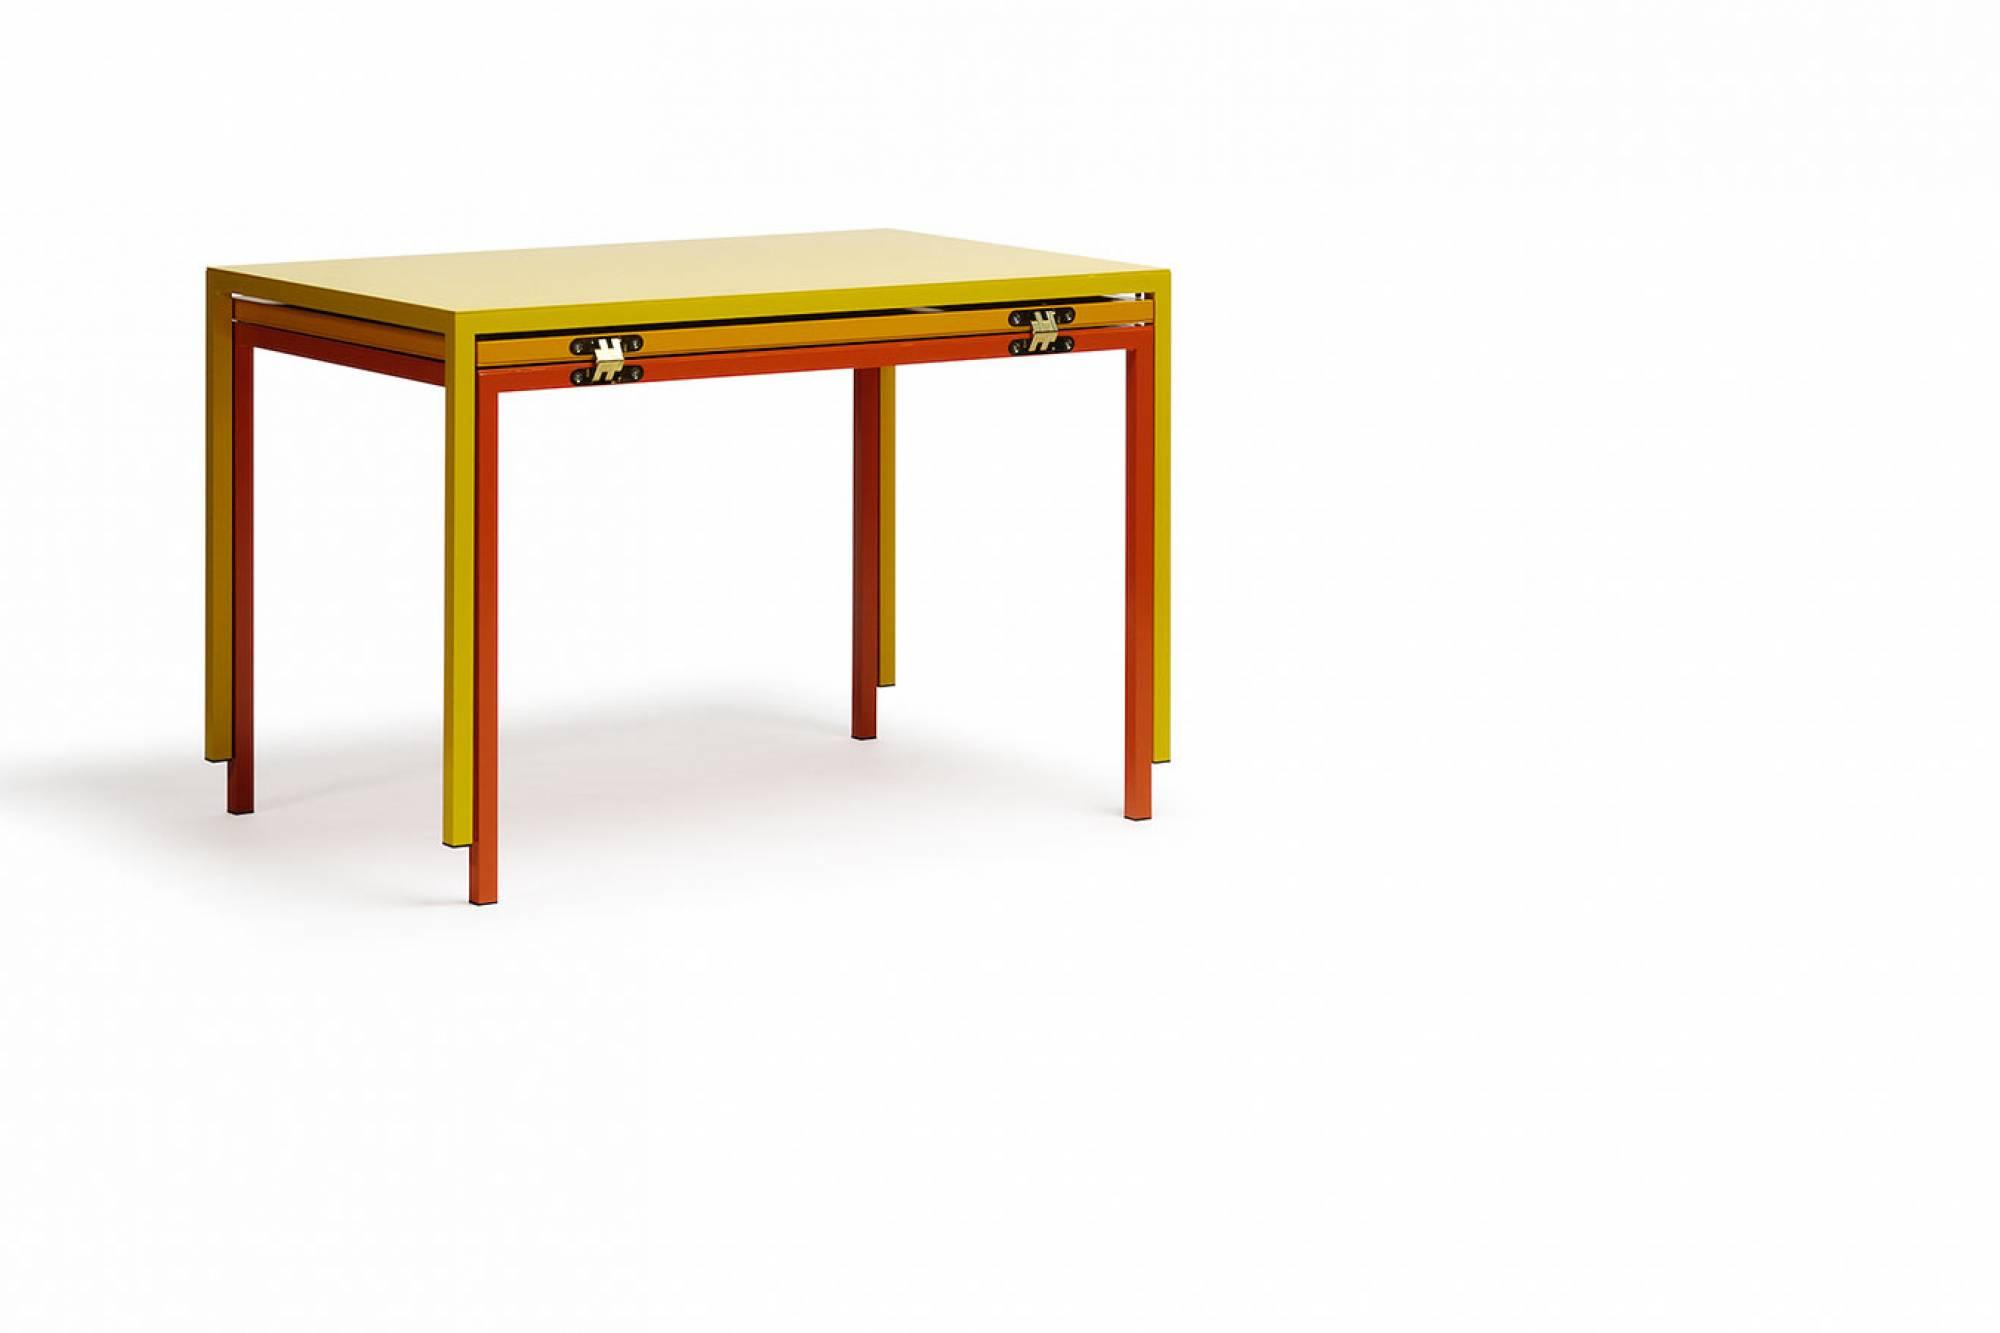 Möbel & Objekte